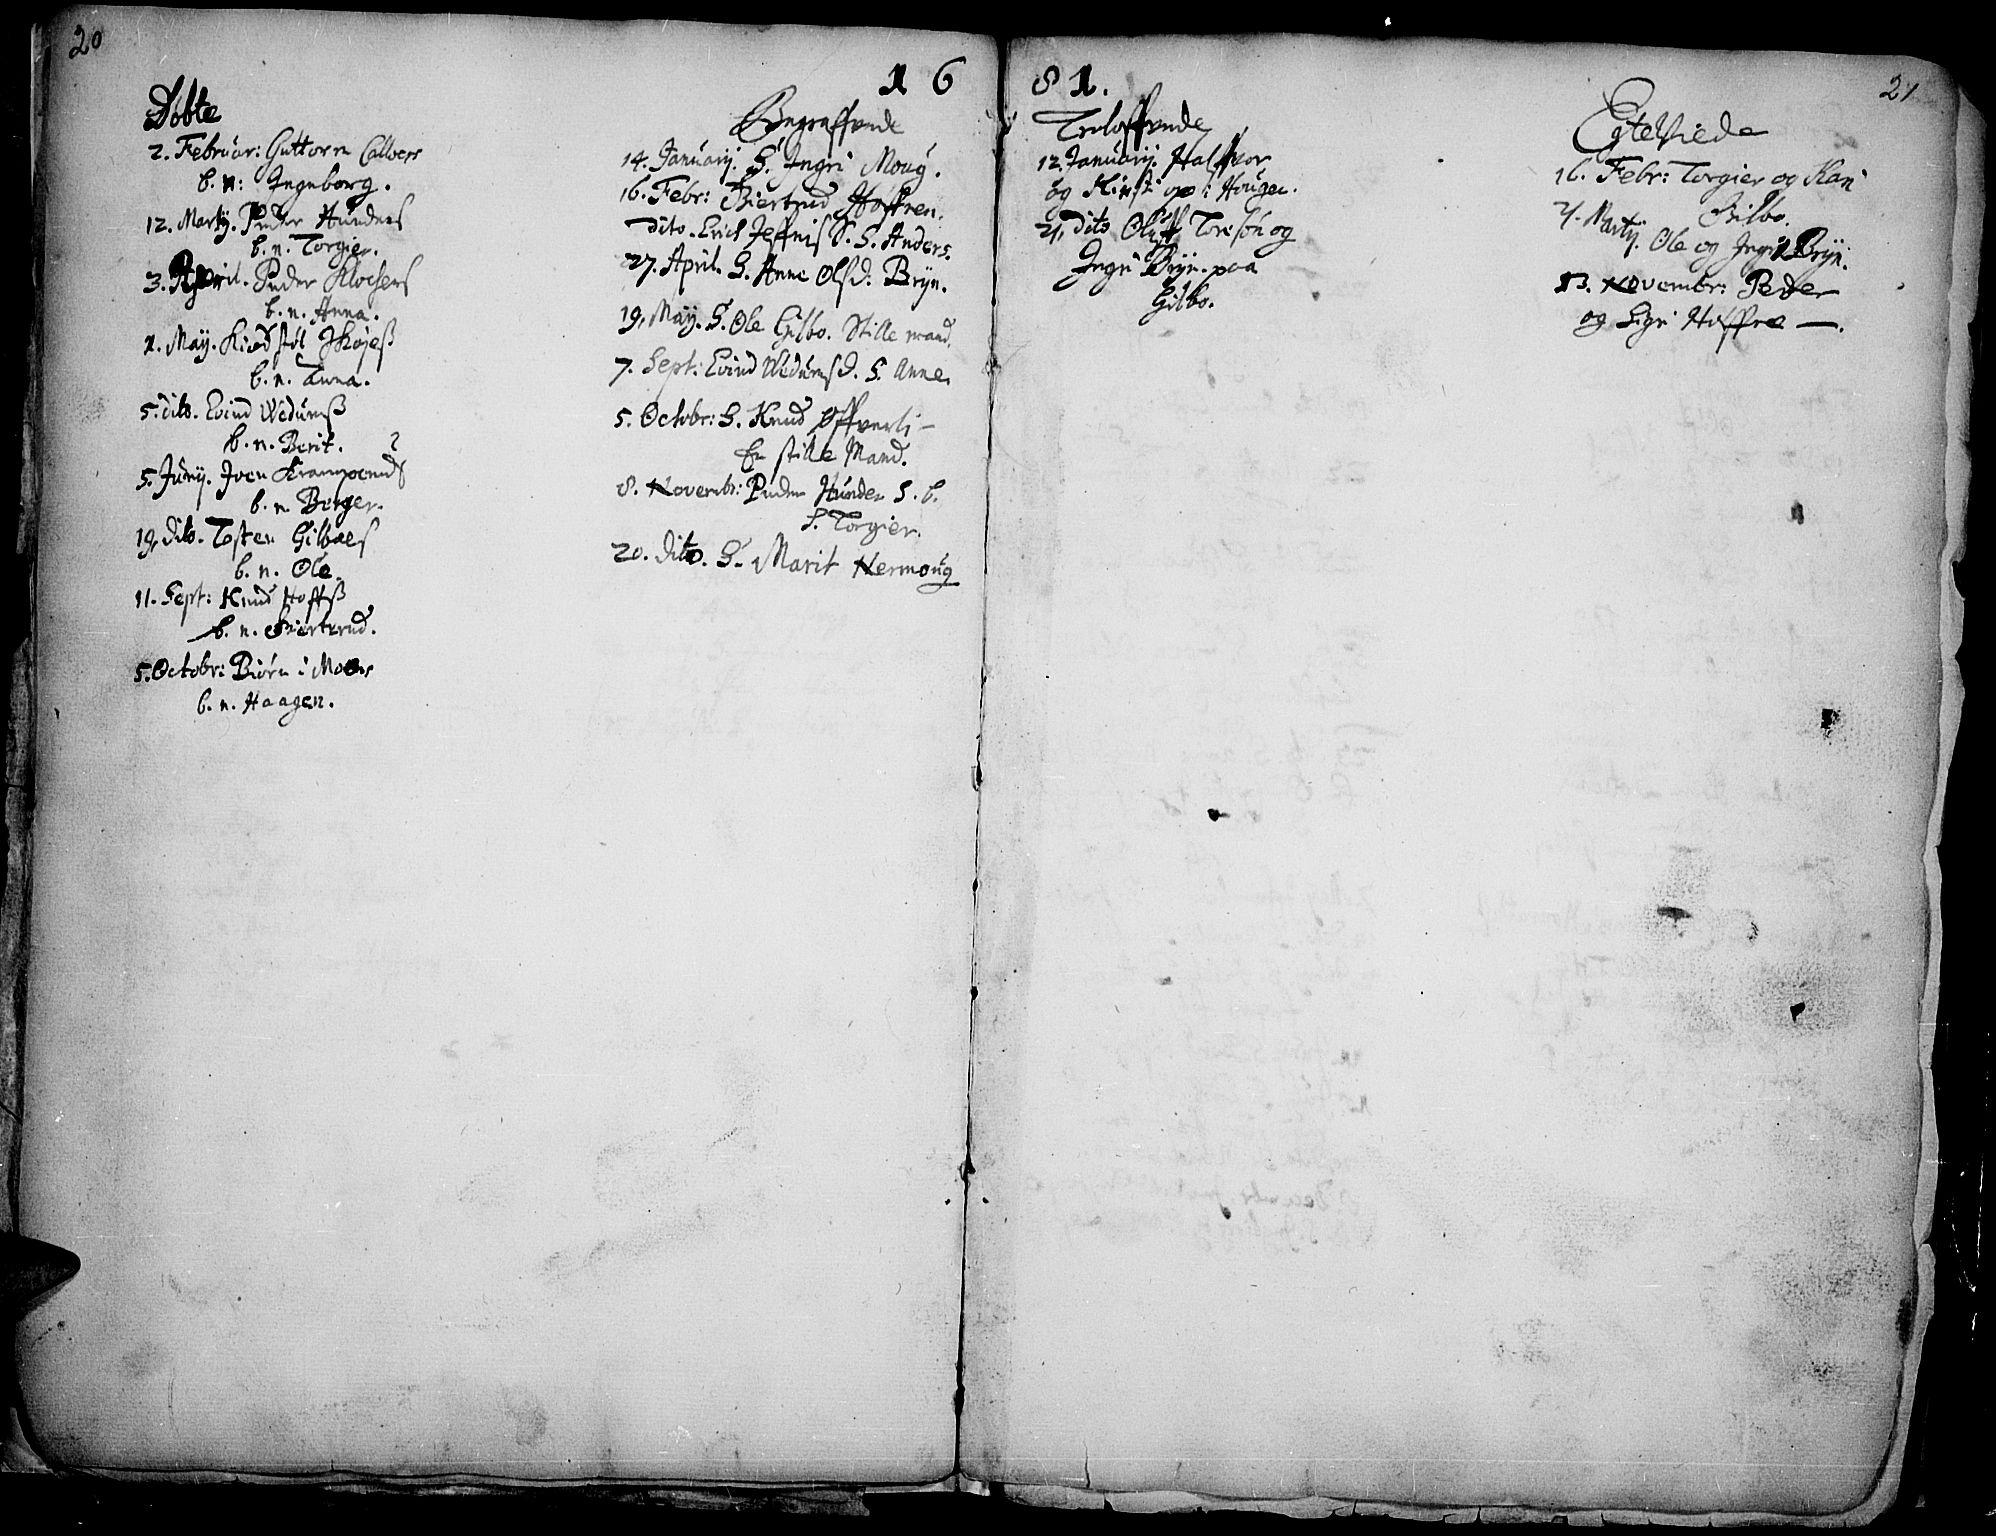 SAH, Øyer prestekontor, Ministerialbok nr. 1, 1671-1727, s. 20-21